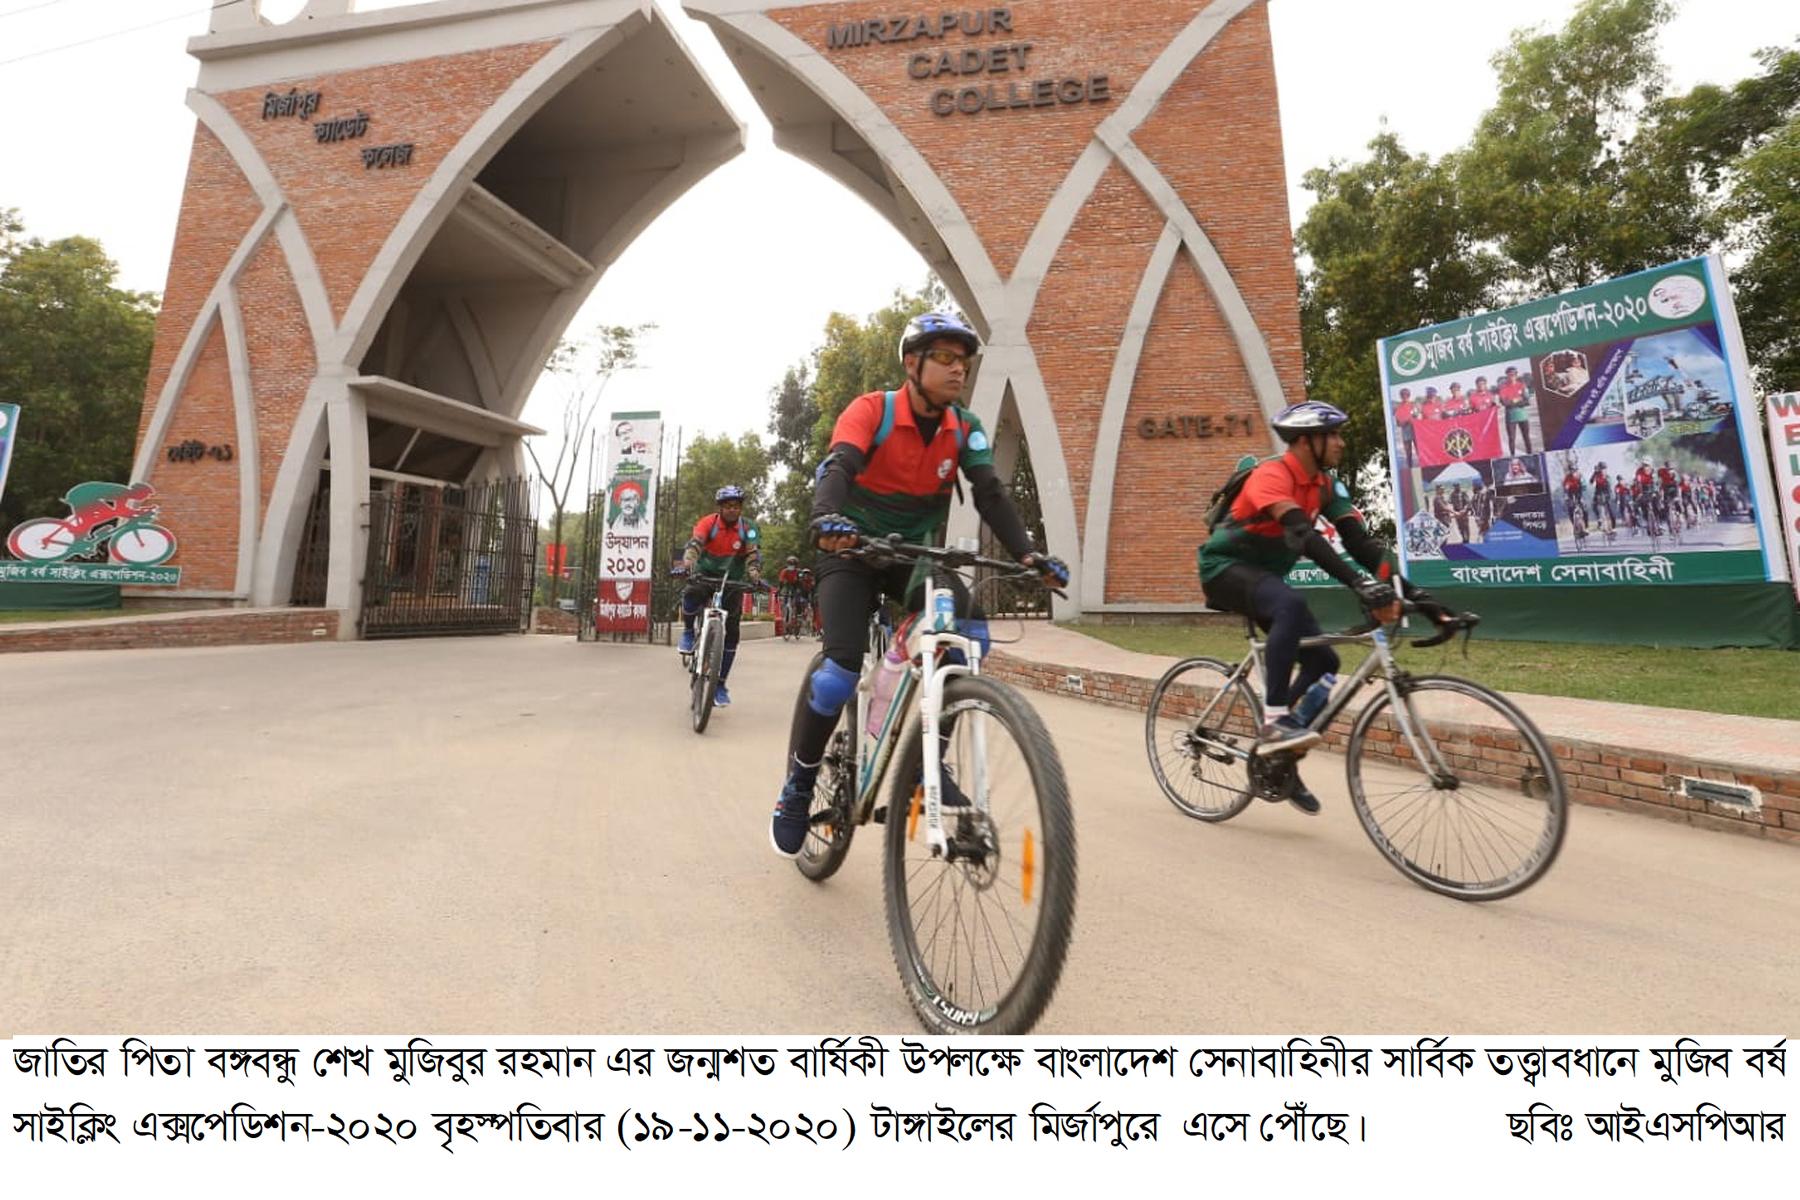 Army Cycling - 19-11-2020 (11)